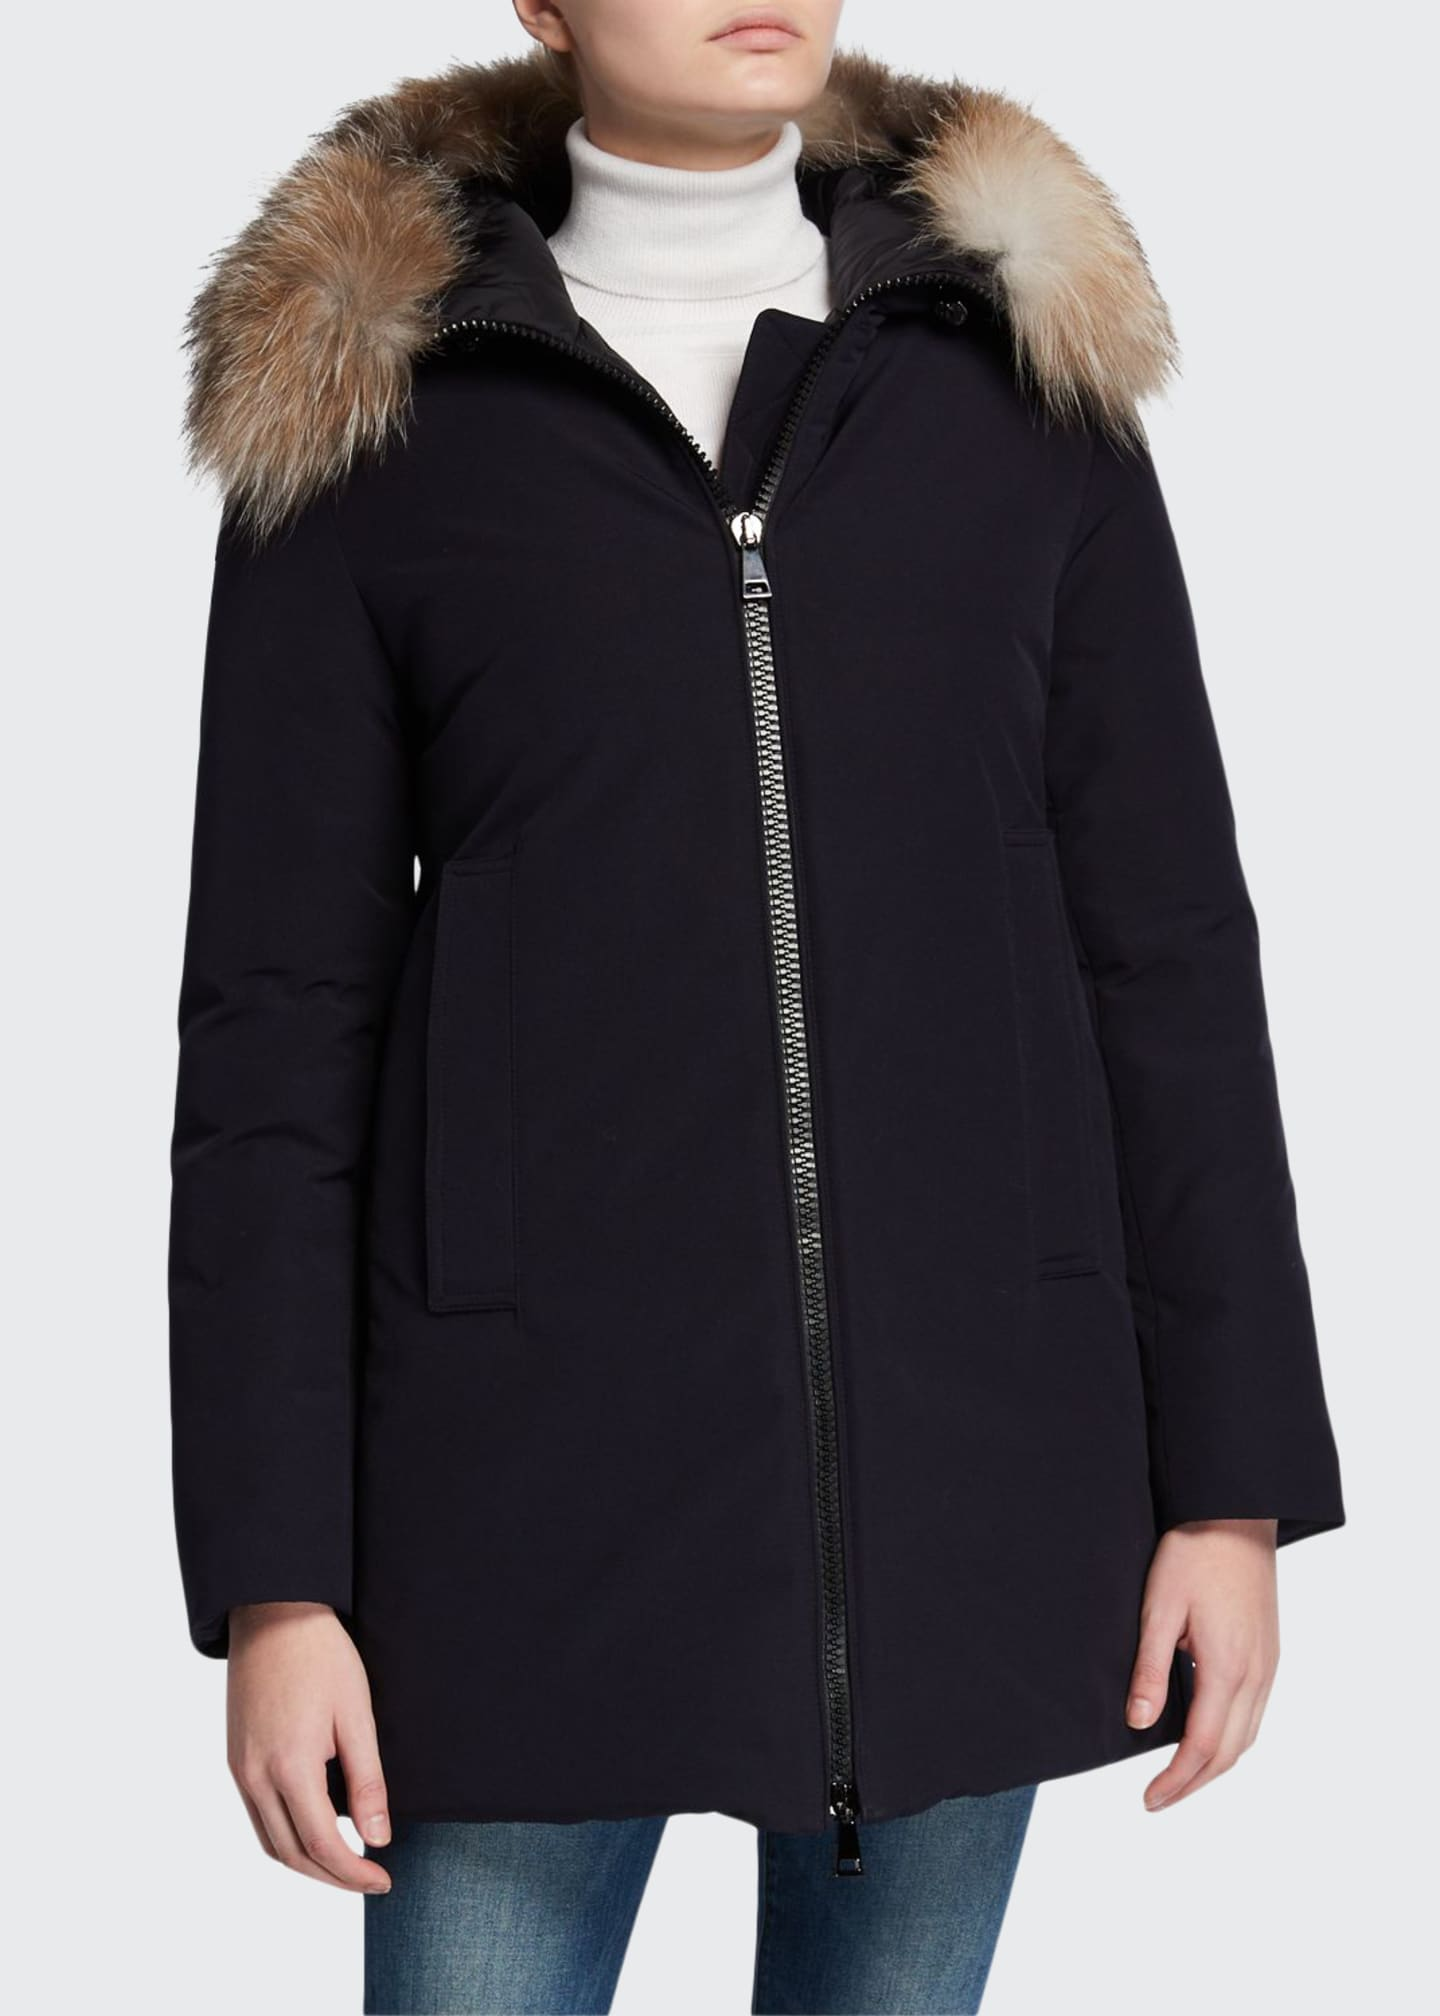 Moncler Blavet Fur-Trim Hooded Coat